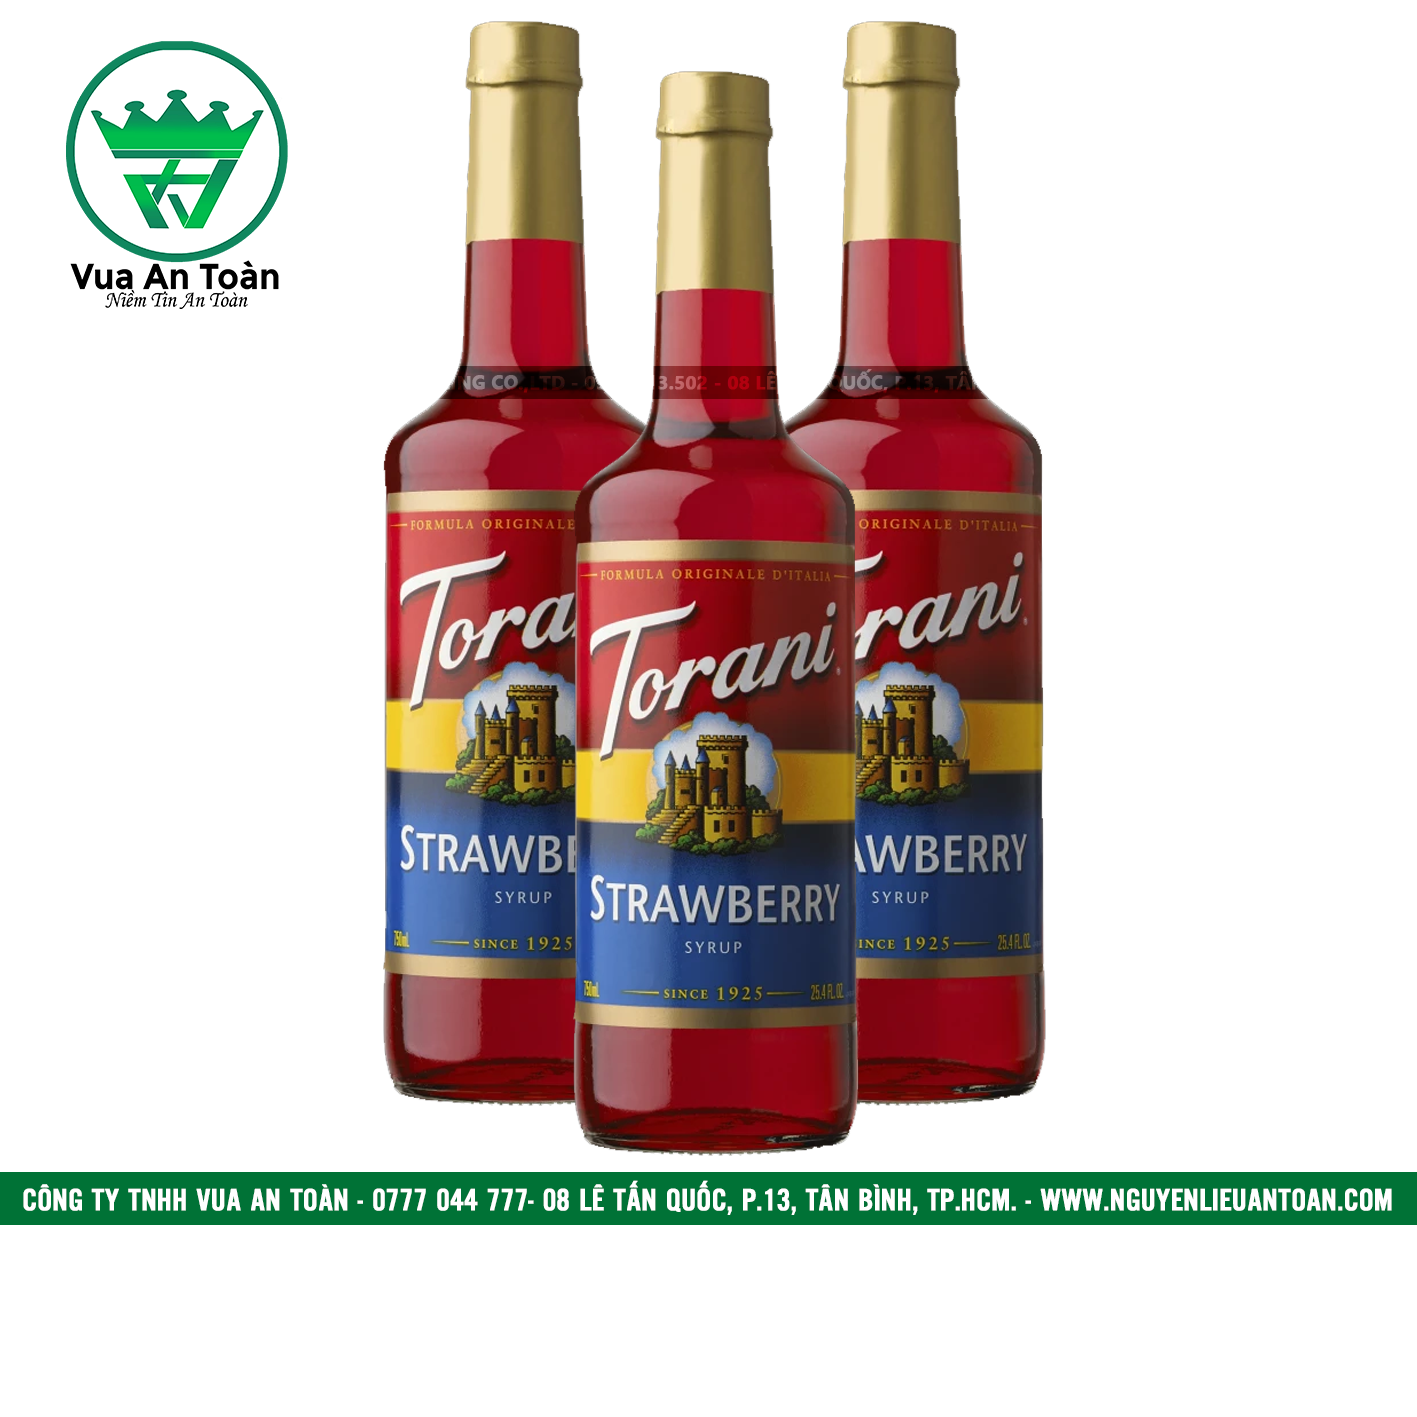 Torani Dâu - Strawberry Syrup